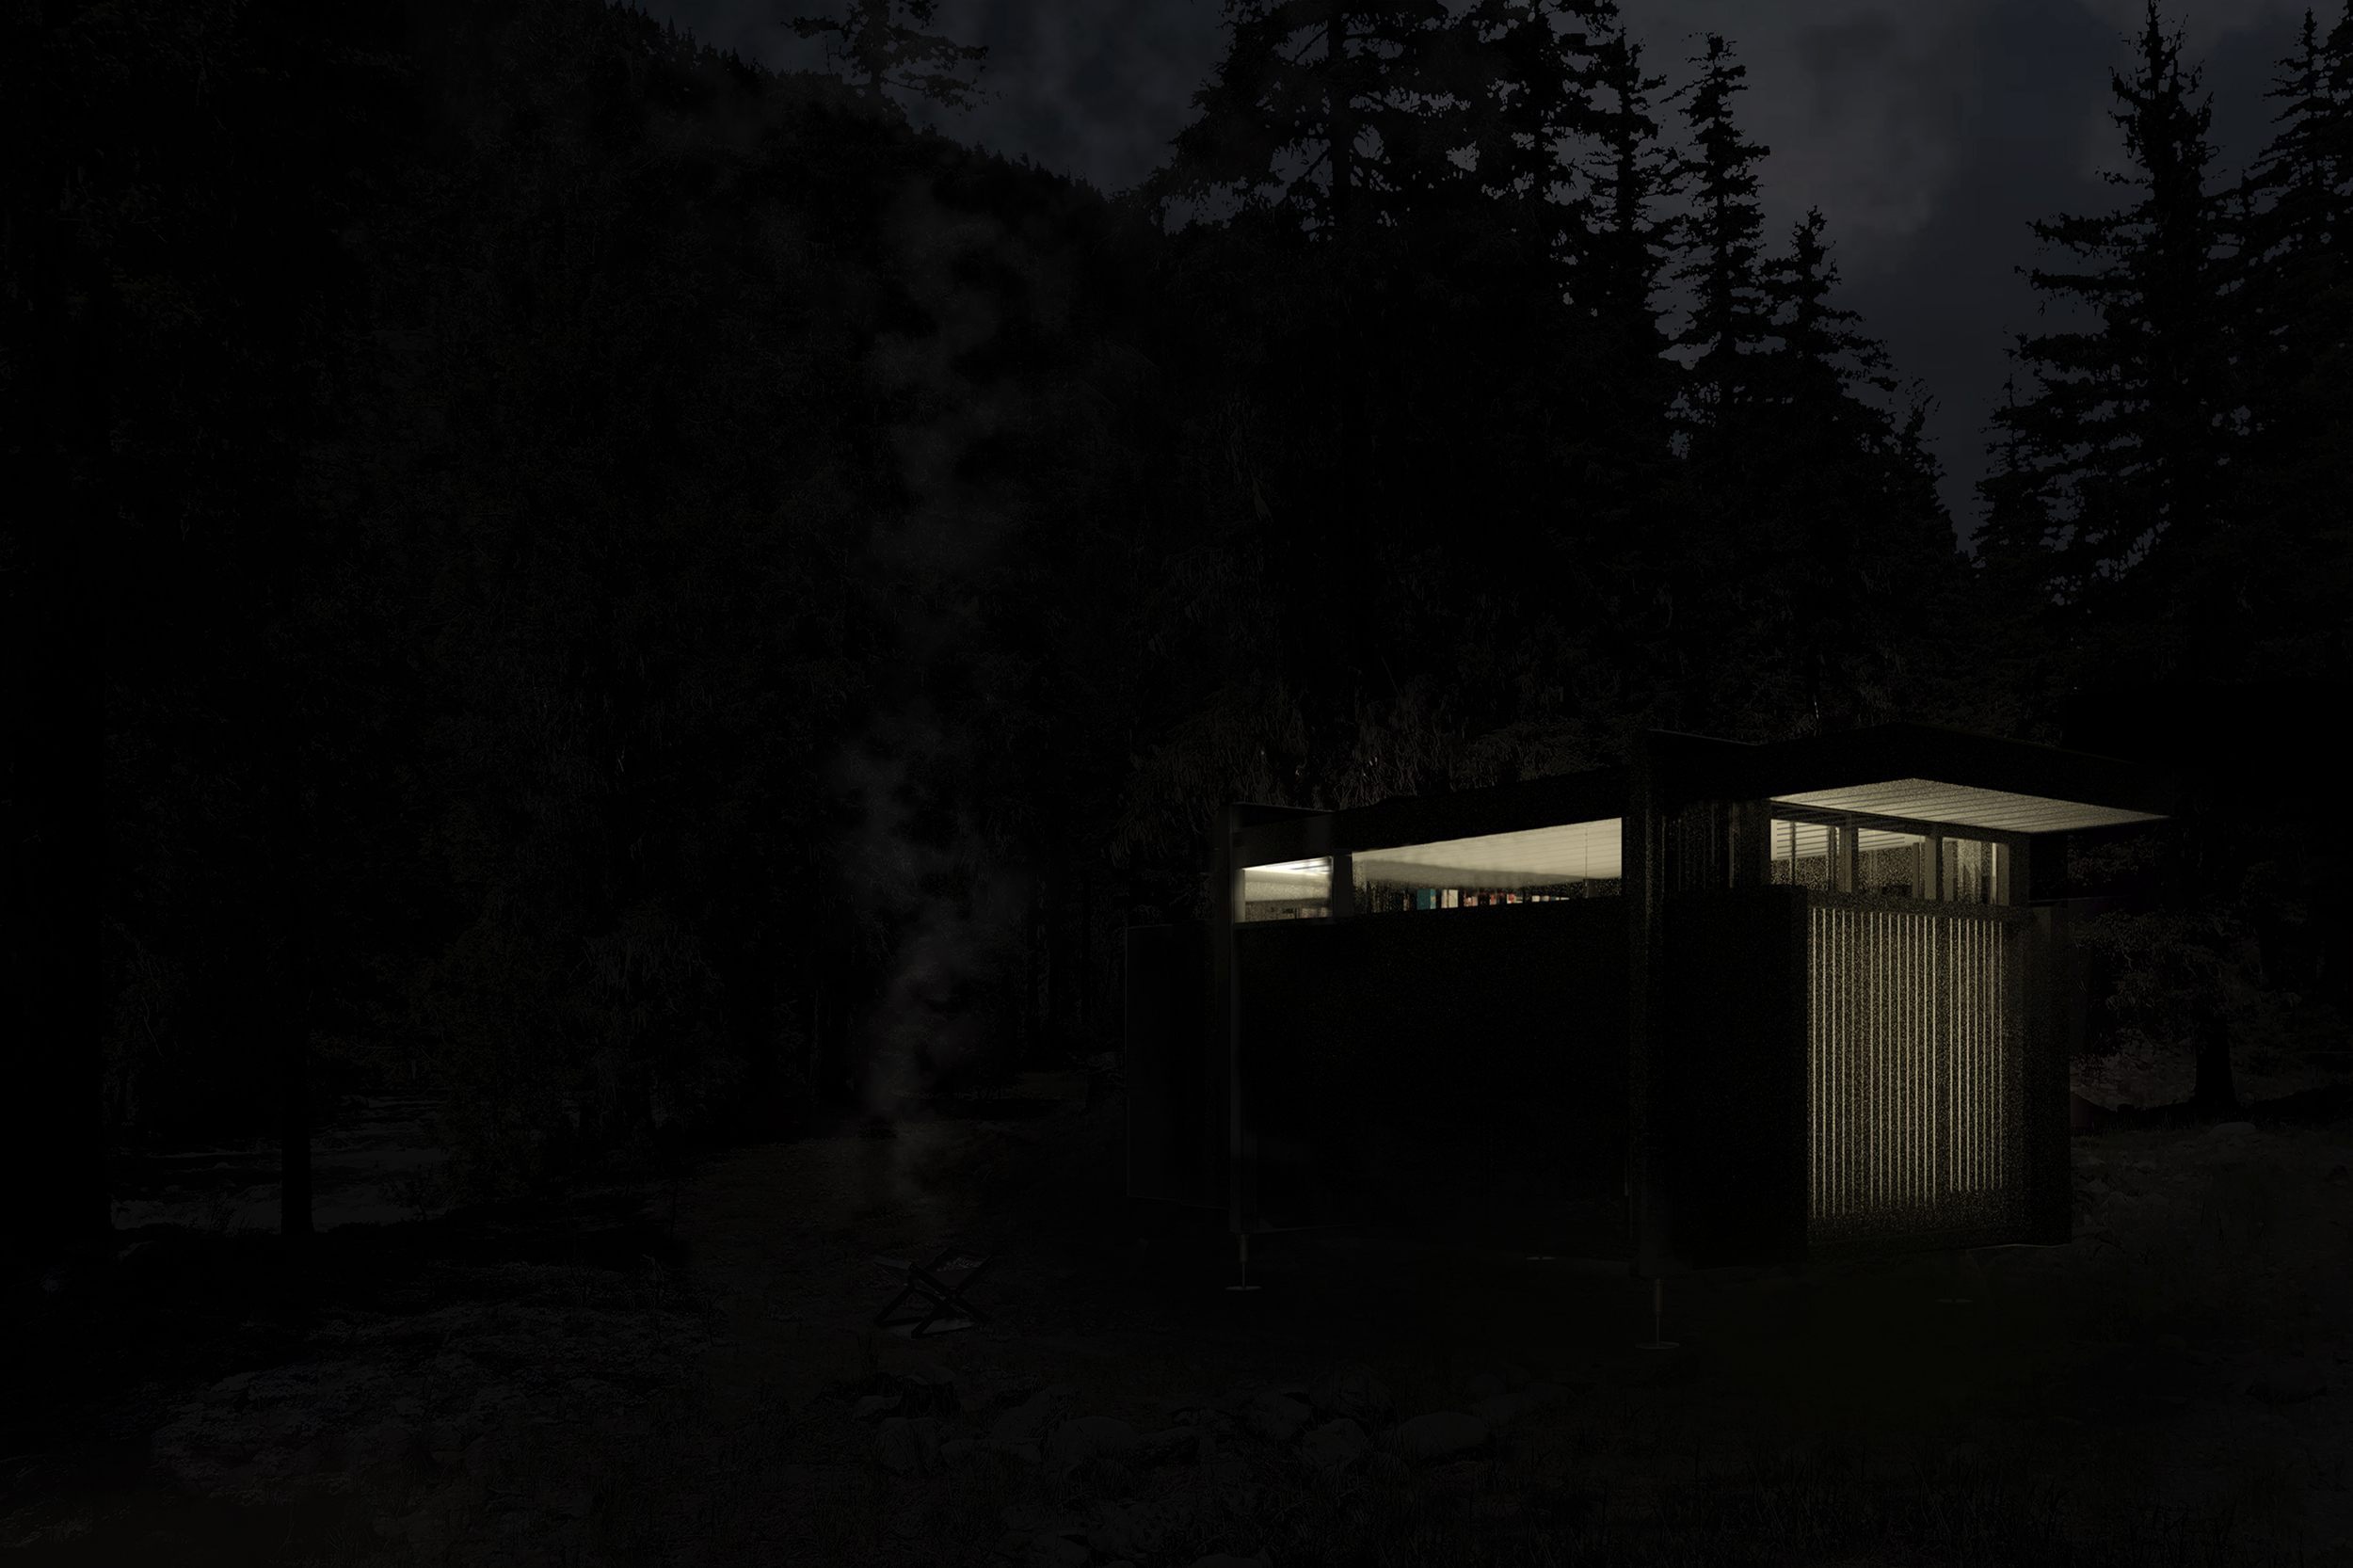 goCstudio_R6 Cabins_Night_Closed.jpg